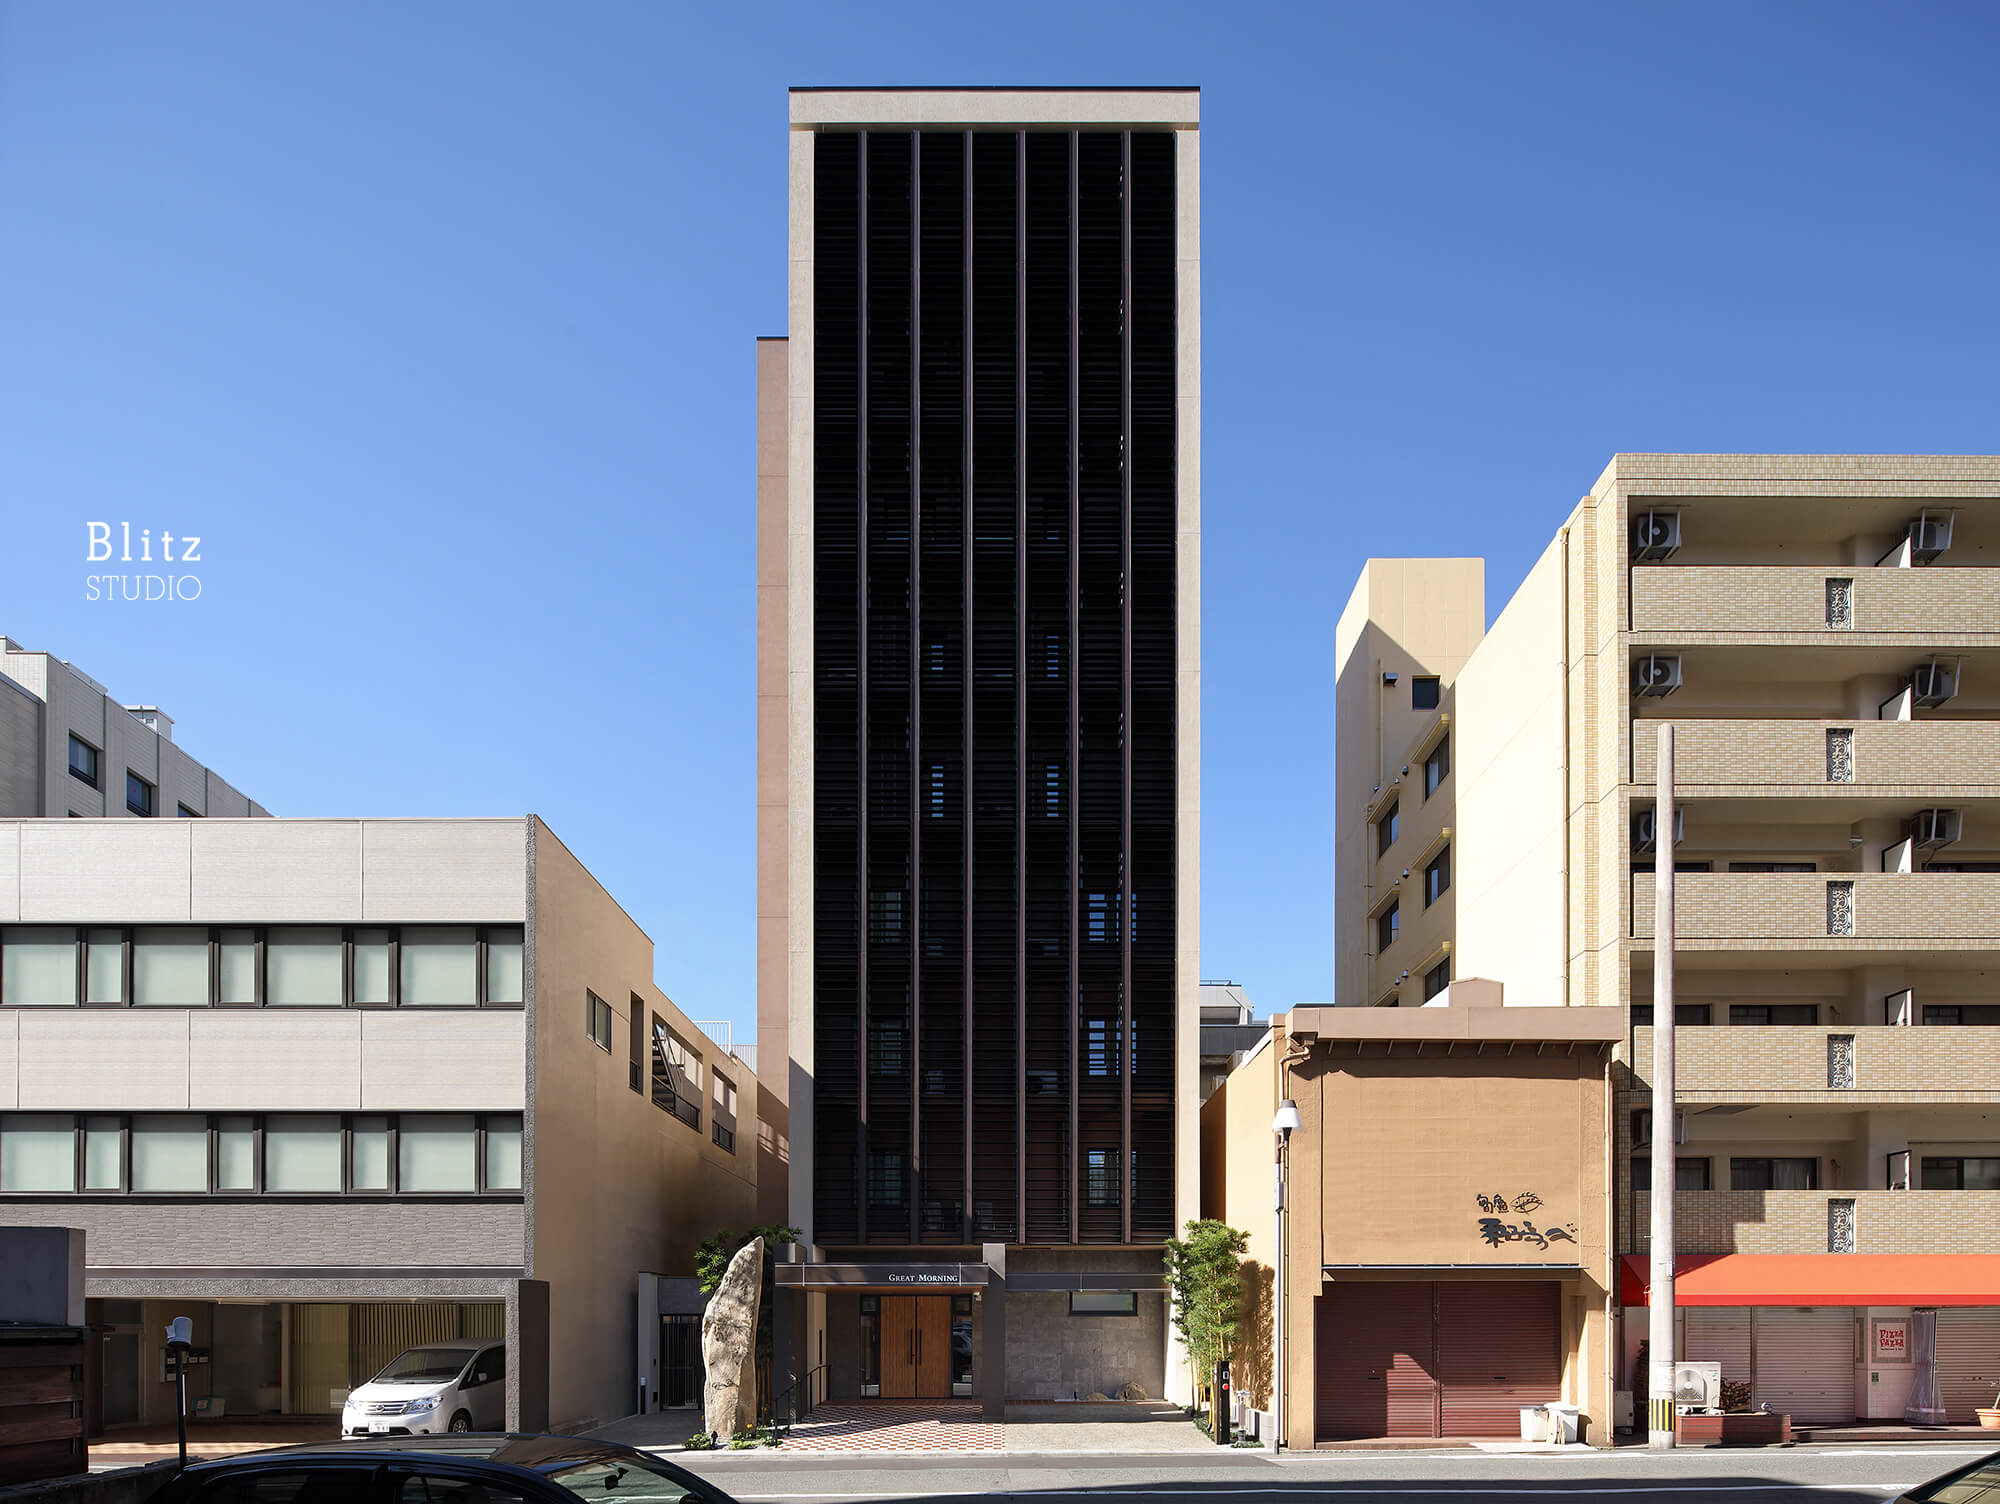 『HOTEL GREAT MORNING』-福岡県福岡市-建築写真・竣工写真・インテリア写真1